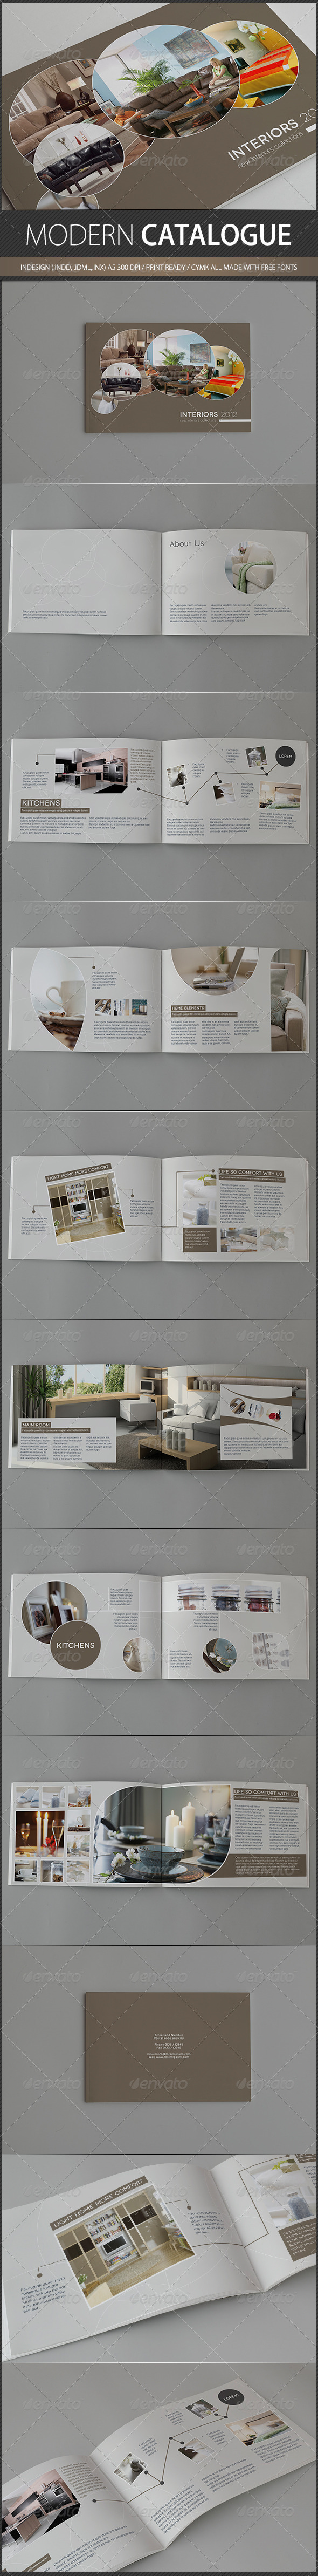 GraphicRiver Modern Catalogue 1483387